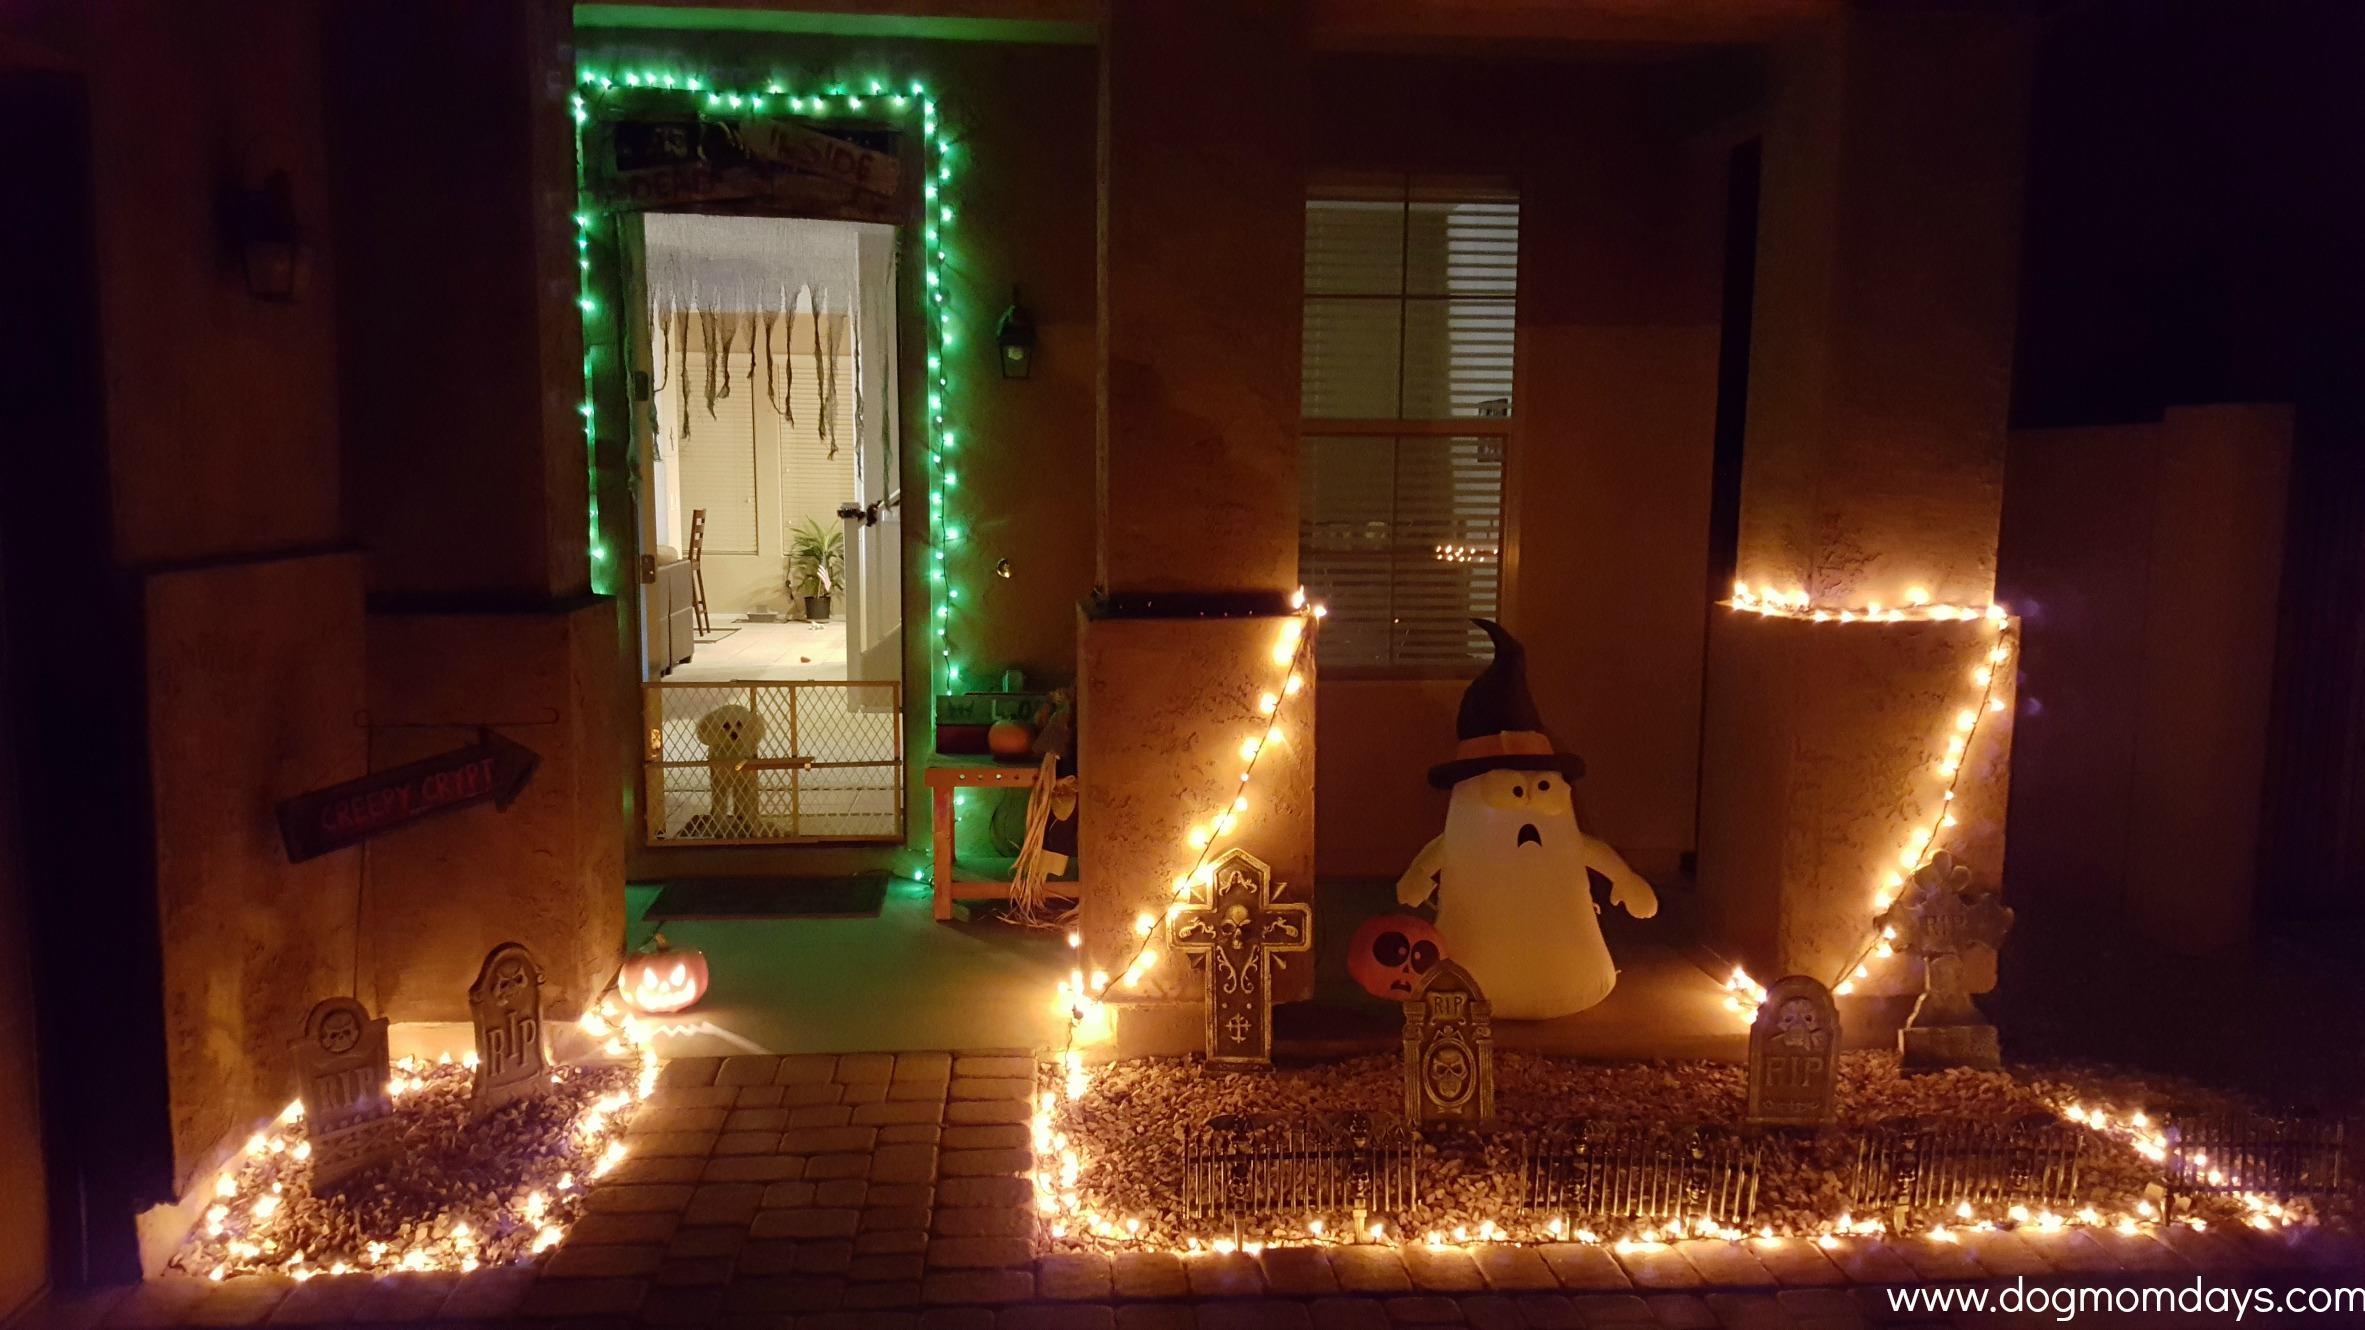 Halloween decorations at night